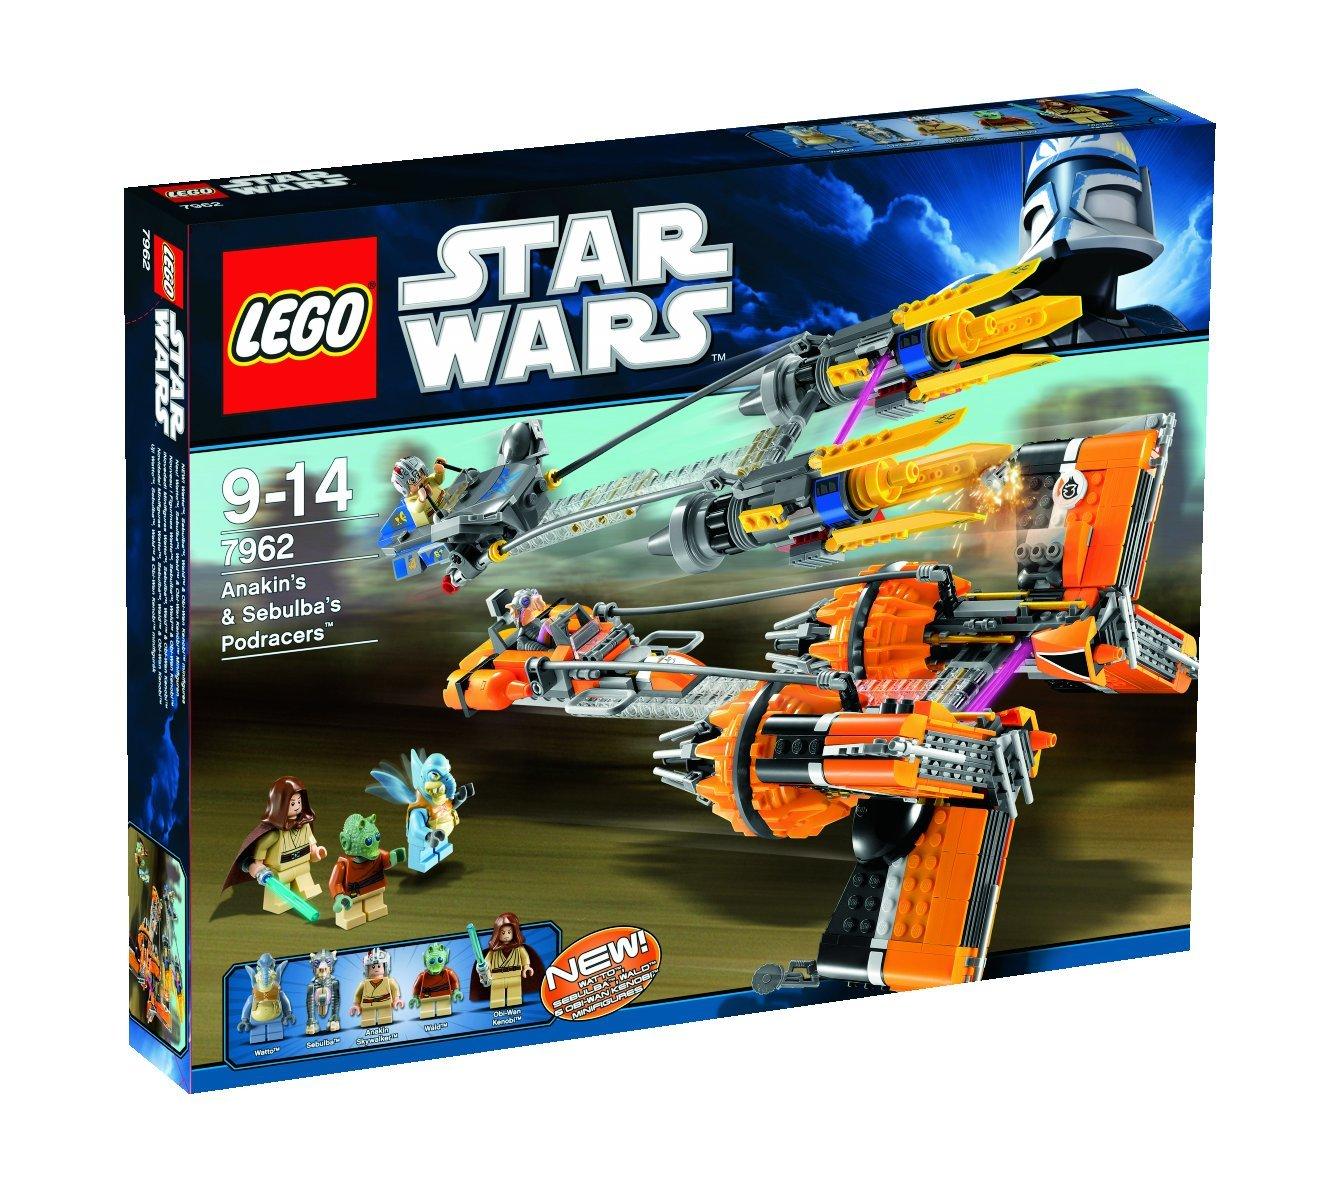 amazon IT: LEGO Star Wars 7962 – Anakins & Sebulba's Podracers für nur 56,16€ inkl. Versand!